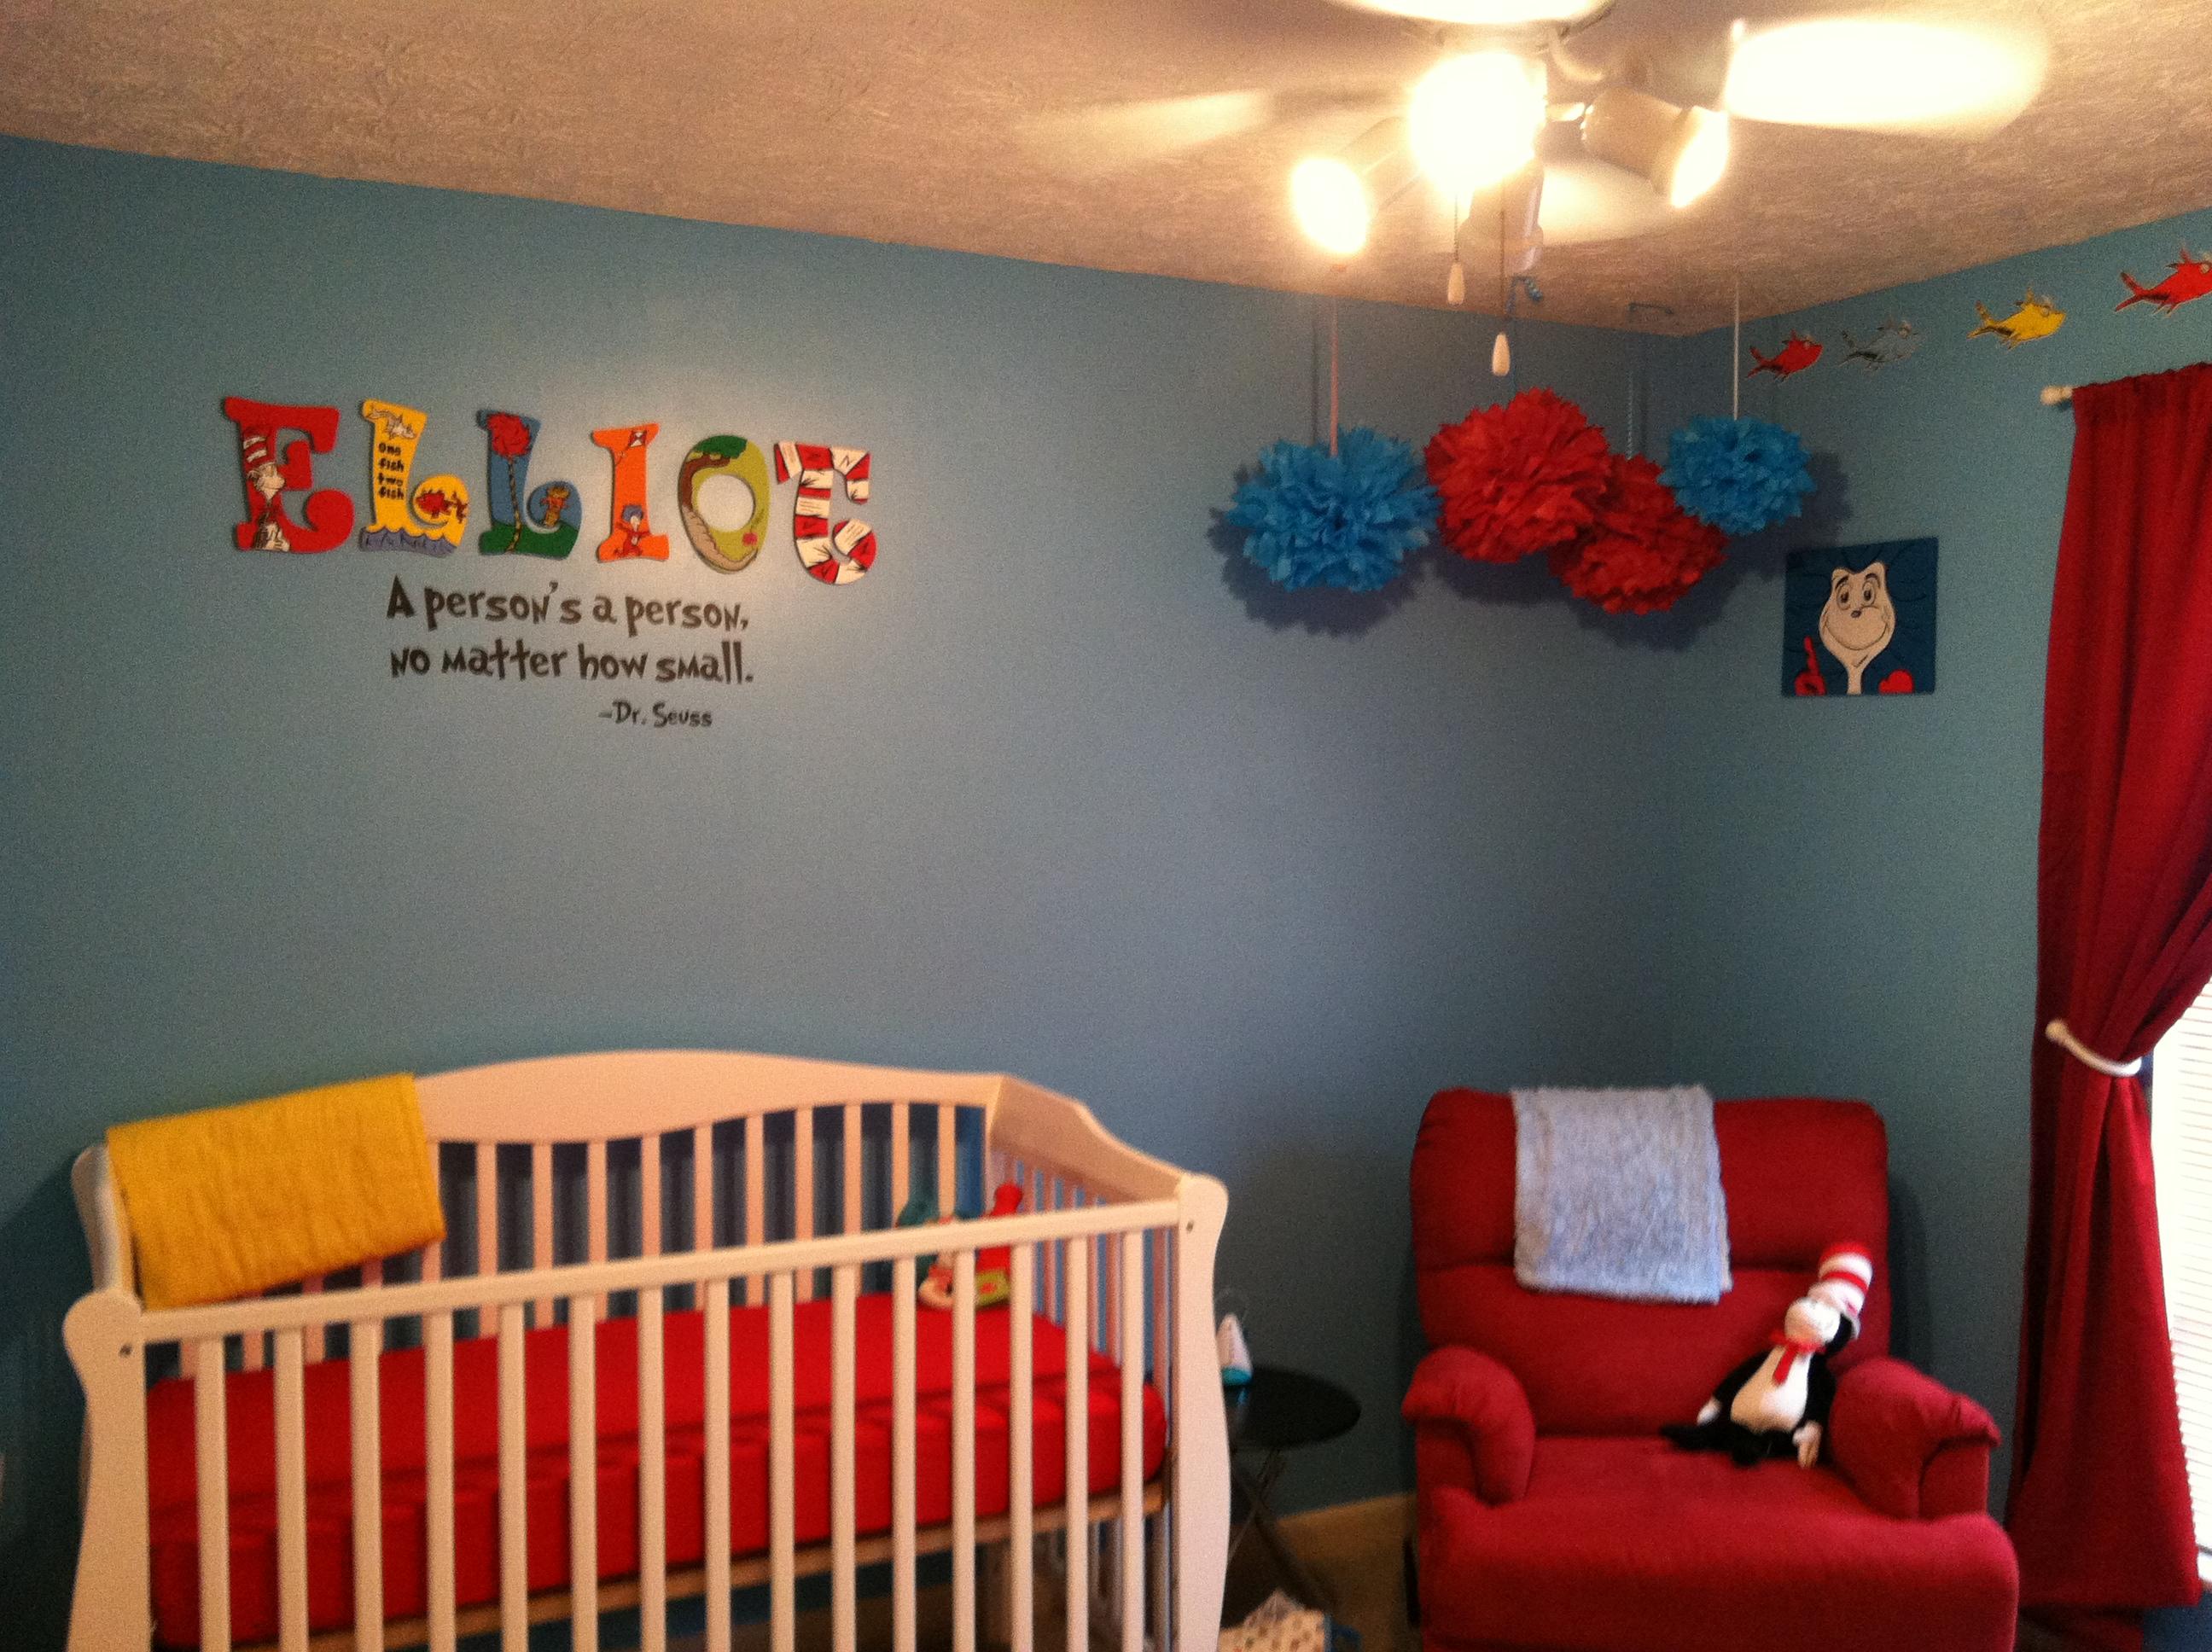 Elliot S Diy Dr Seuss Nursery Project Nursery